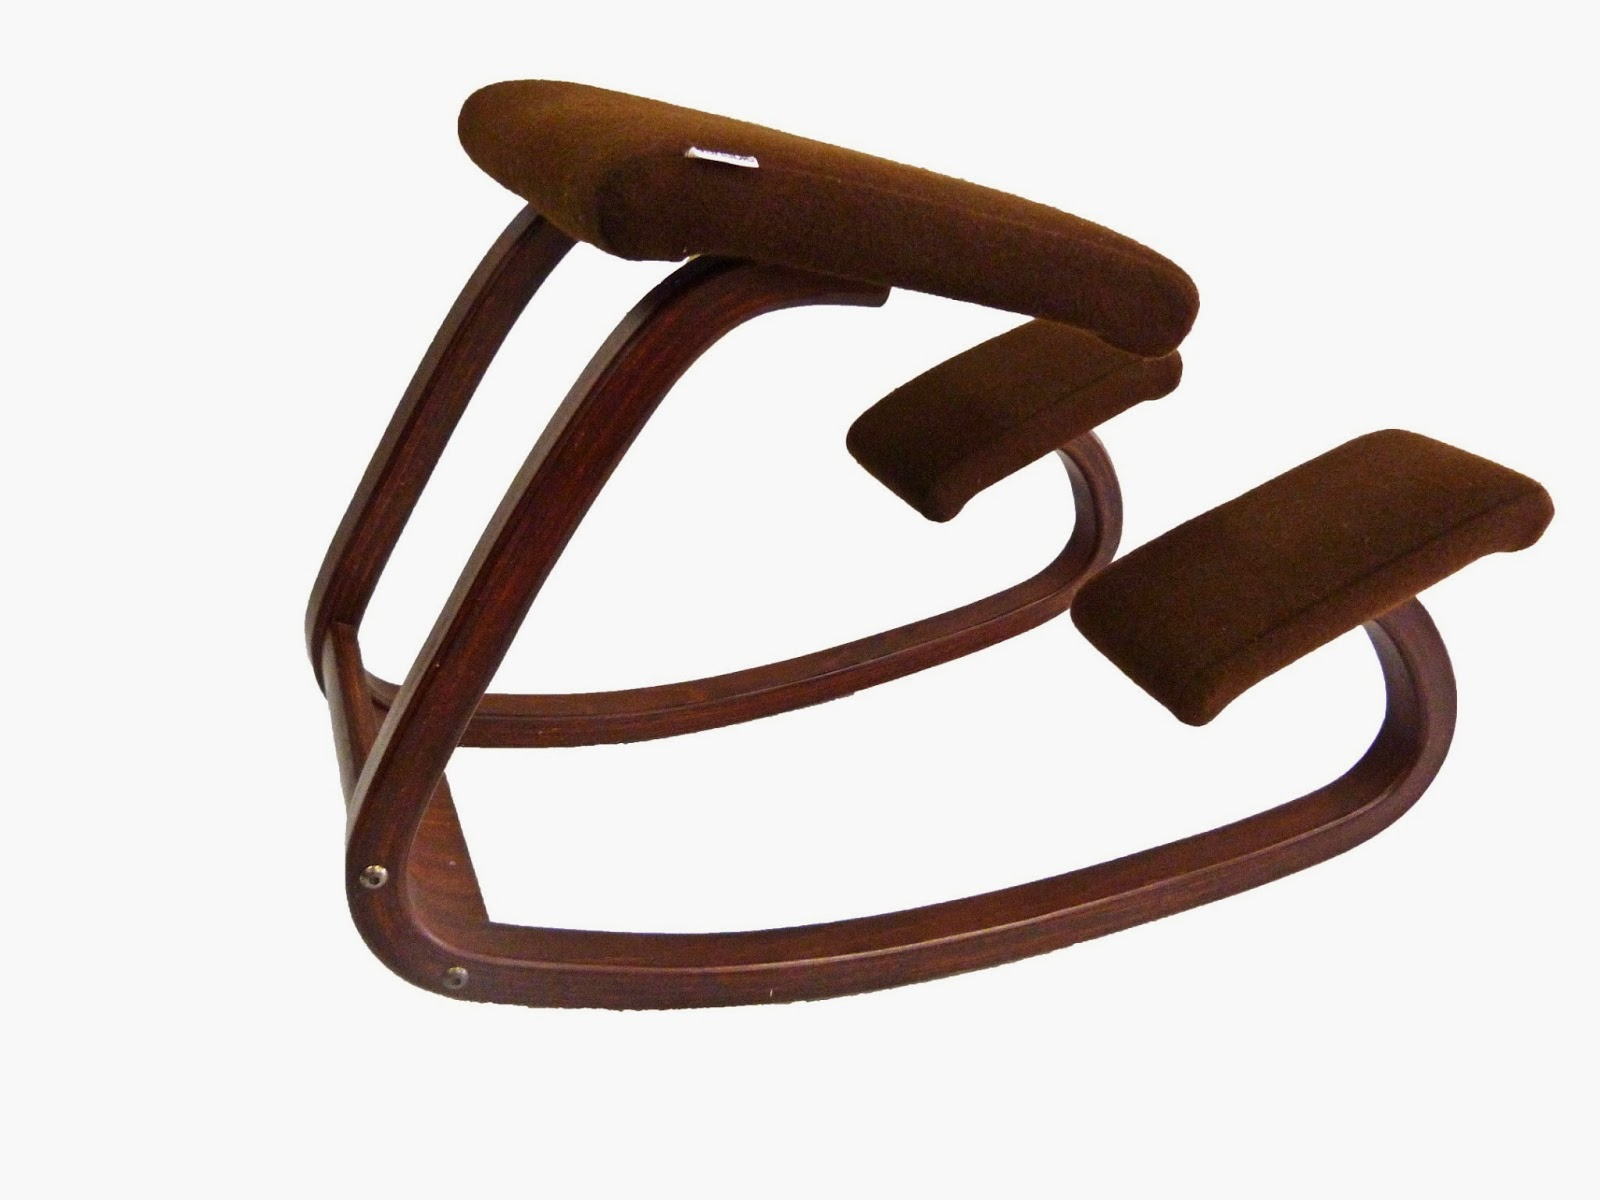 posture chair varier rocking danish design modern mid century vintage furniture shop used